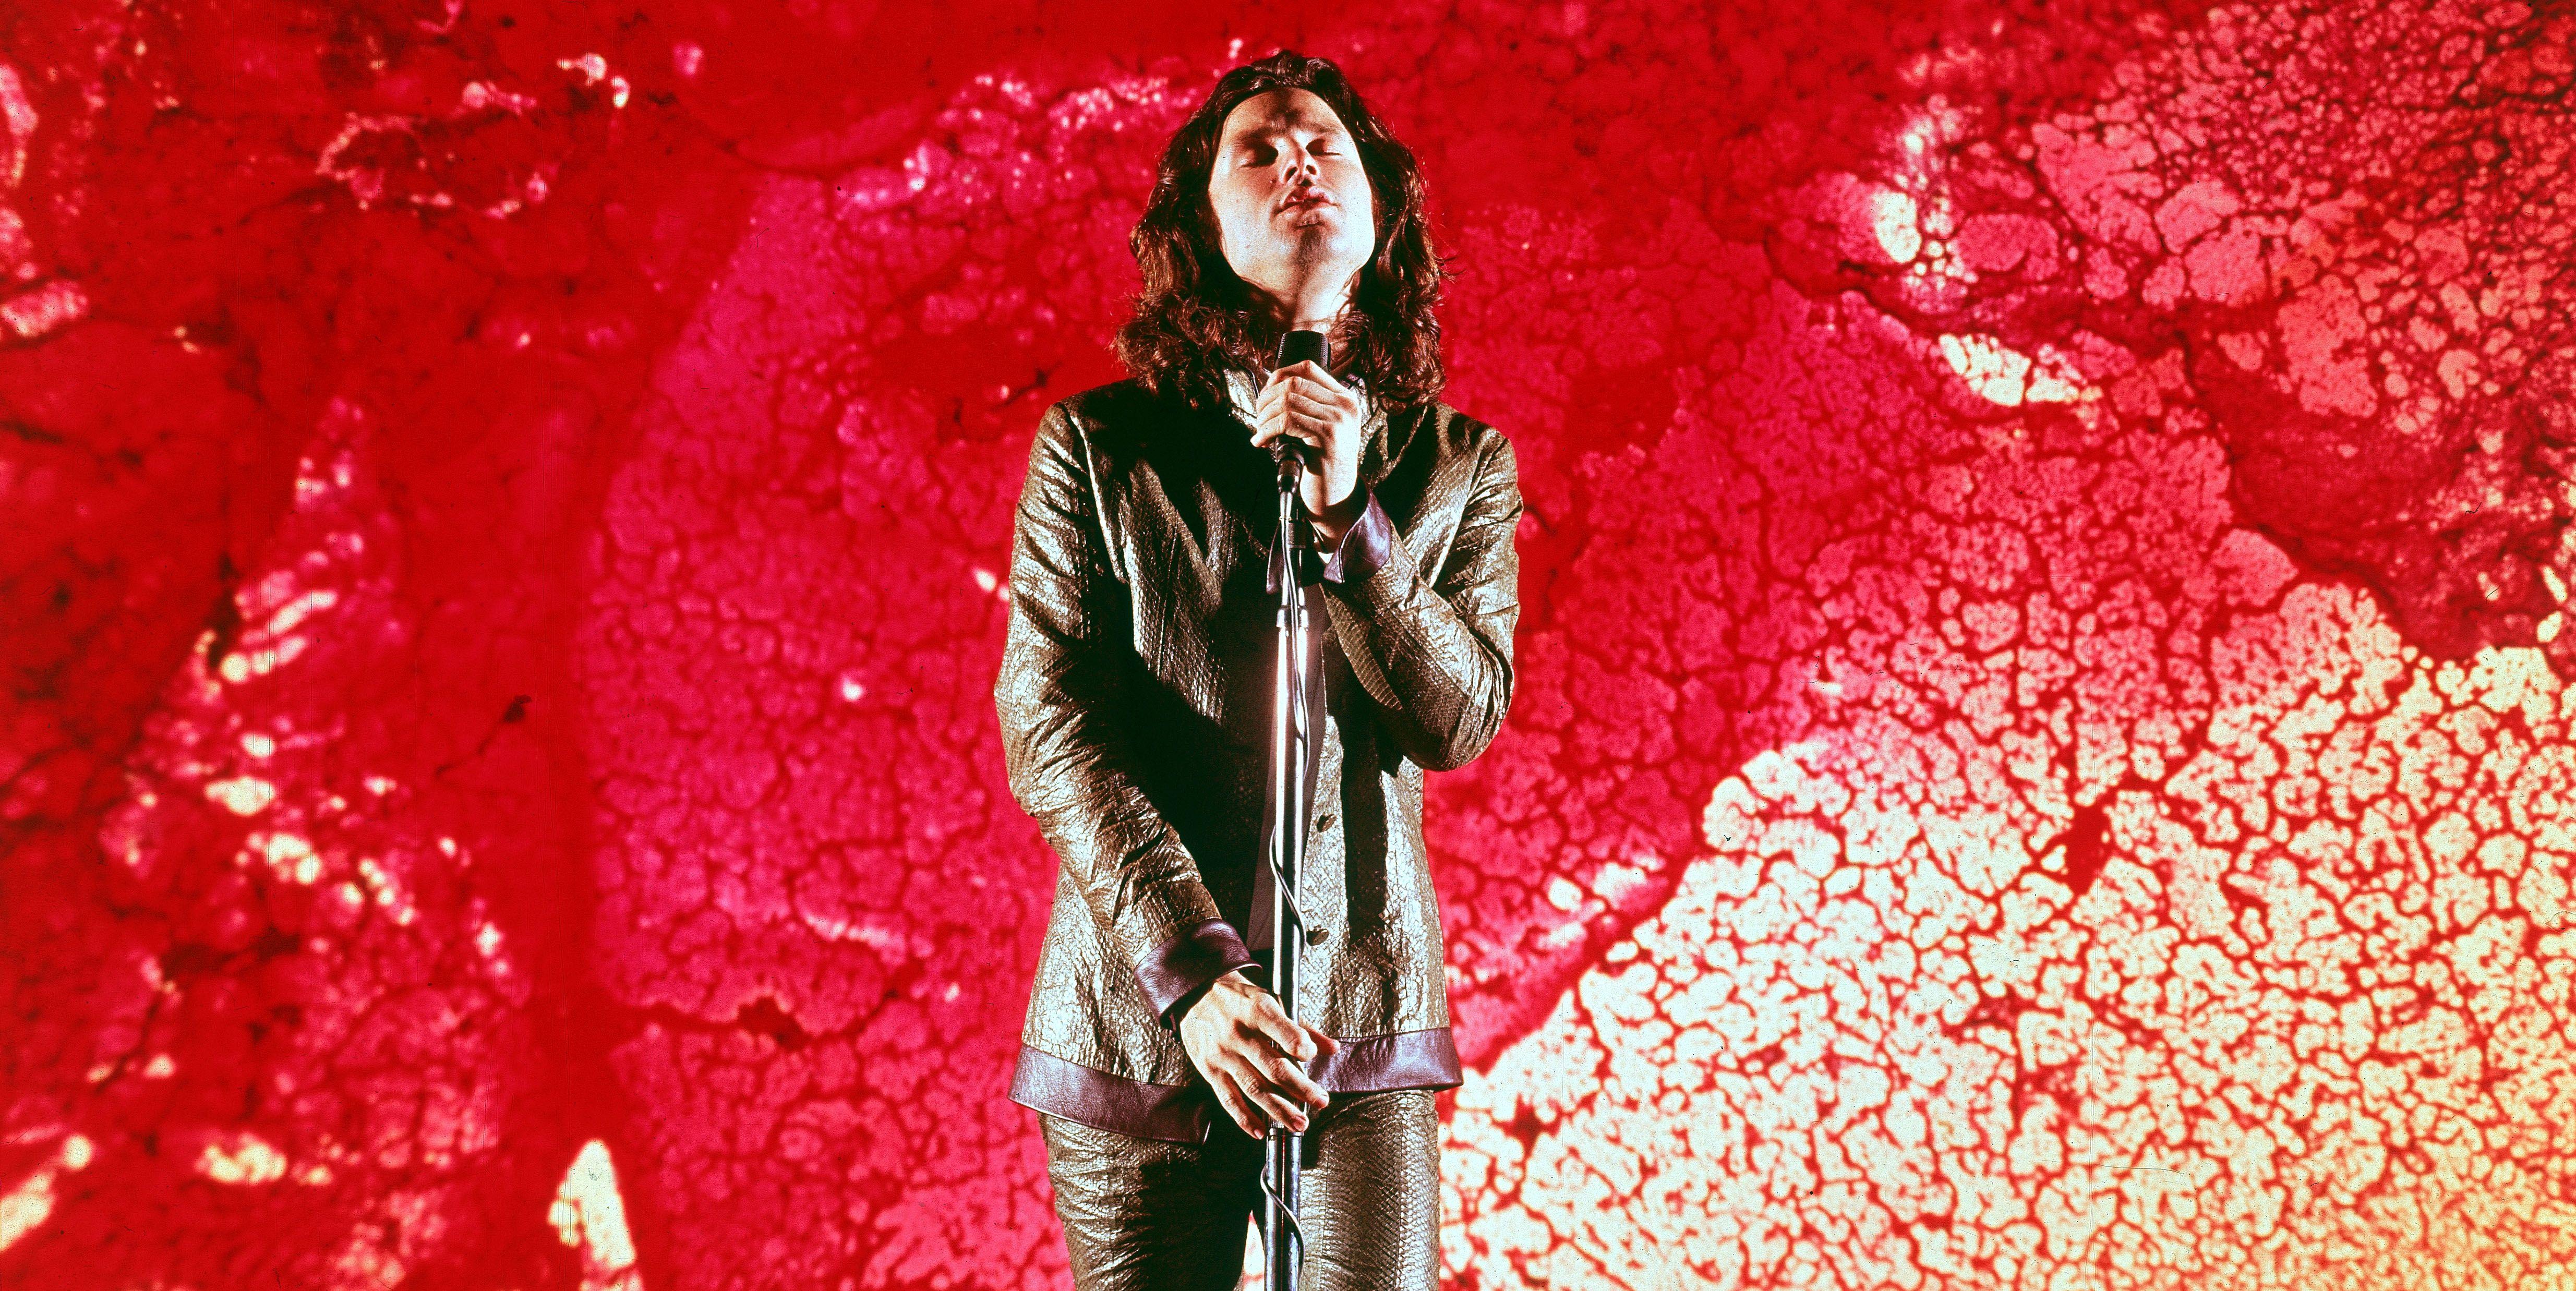 Remembering Jim Morrison Through His Own Words